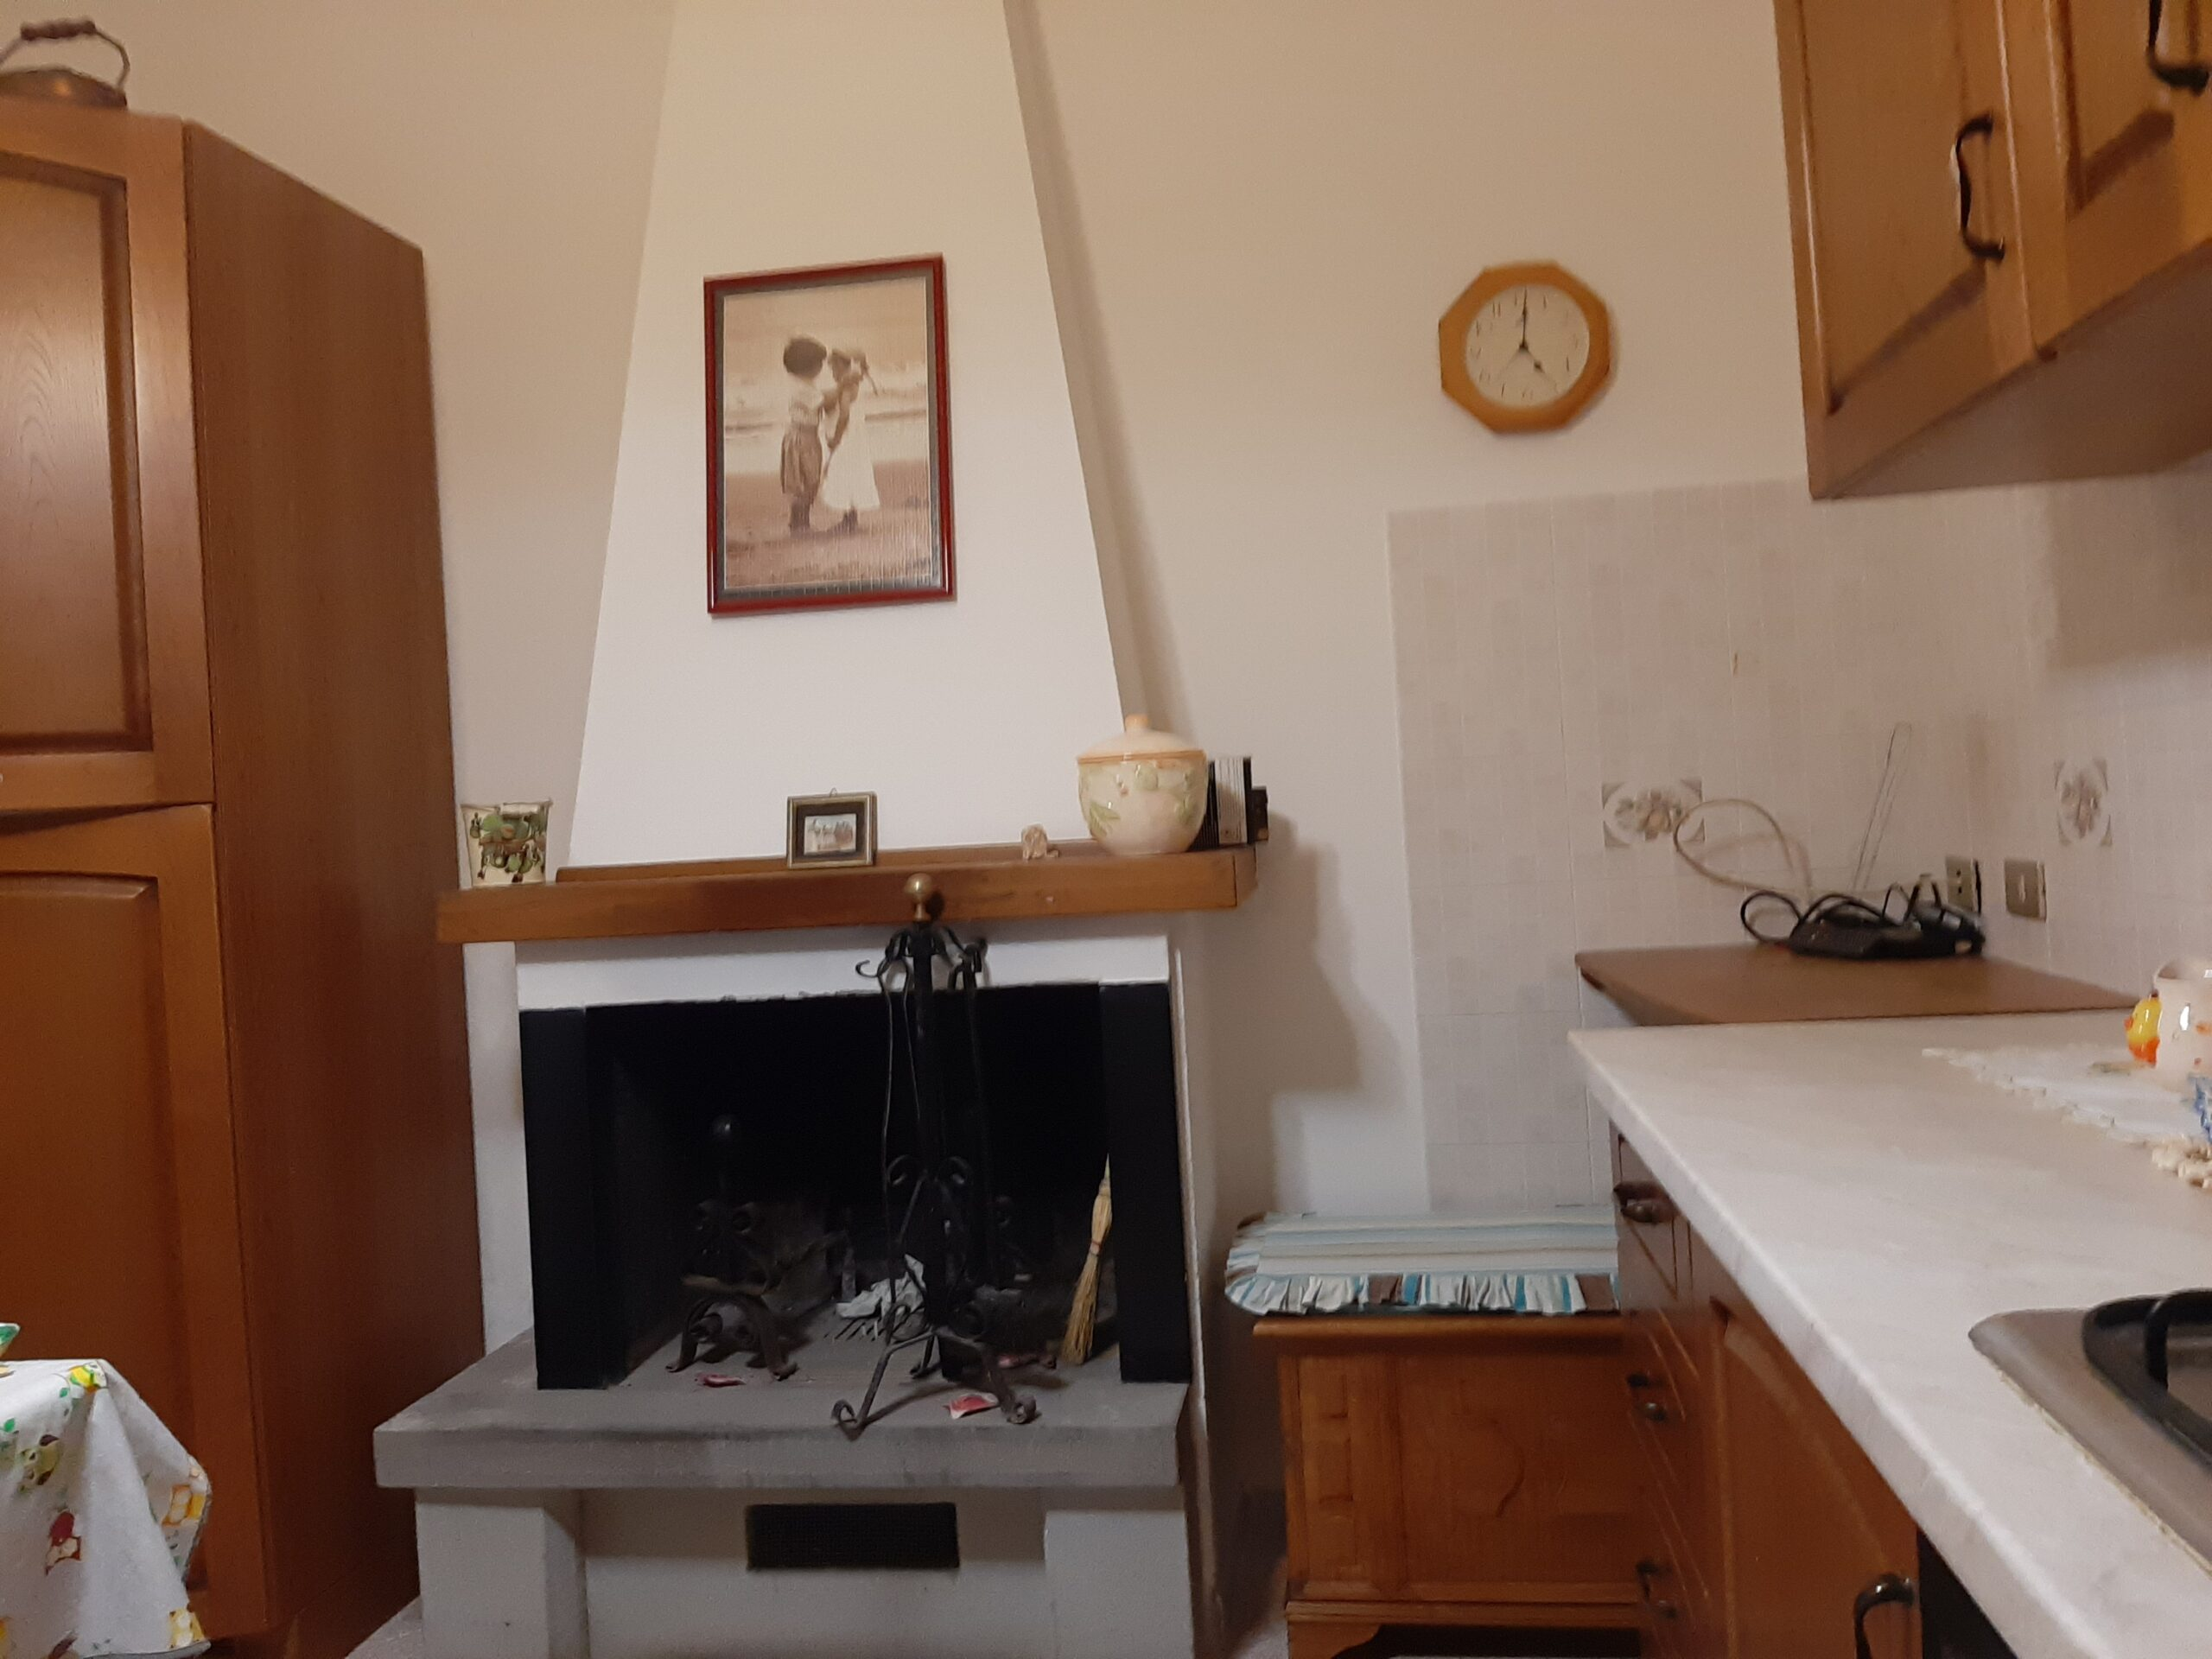 Lunigiana : Casa in pietra abitabile in borgo medioevale. 2395